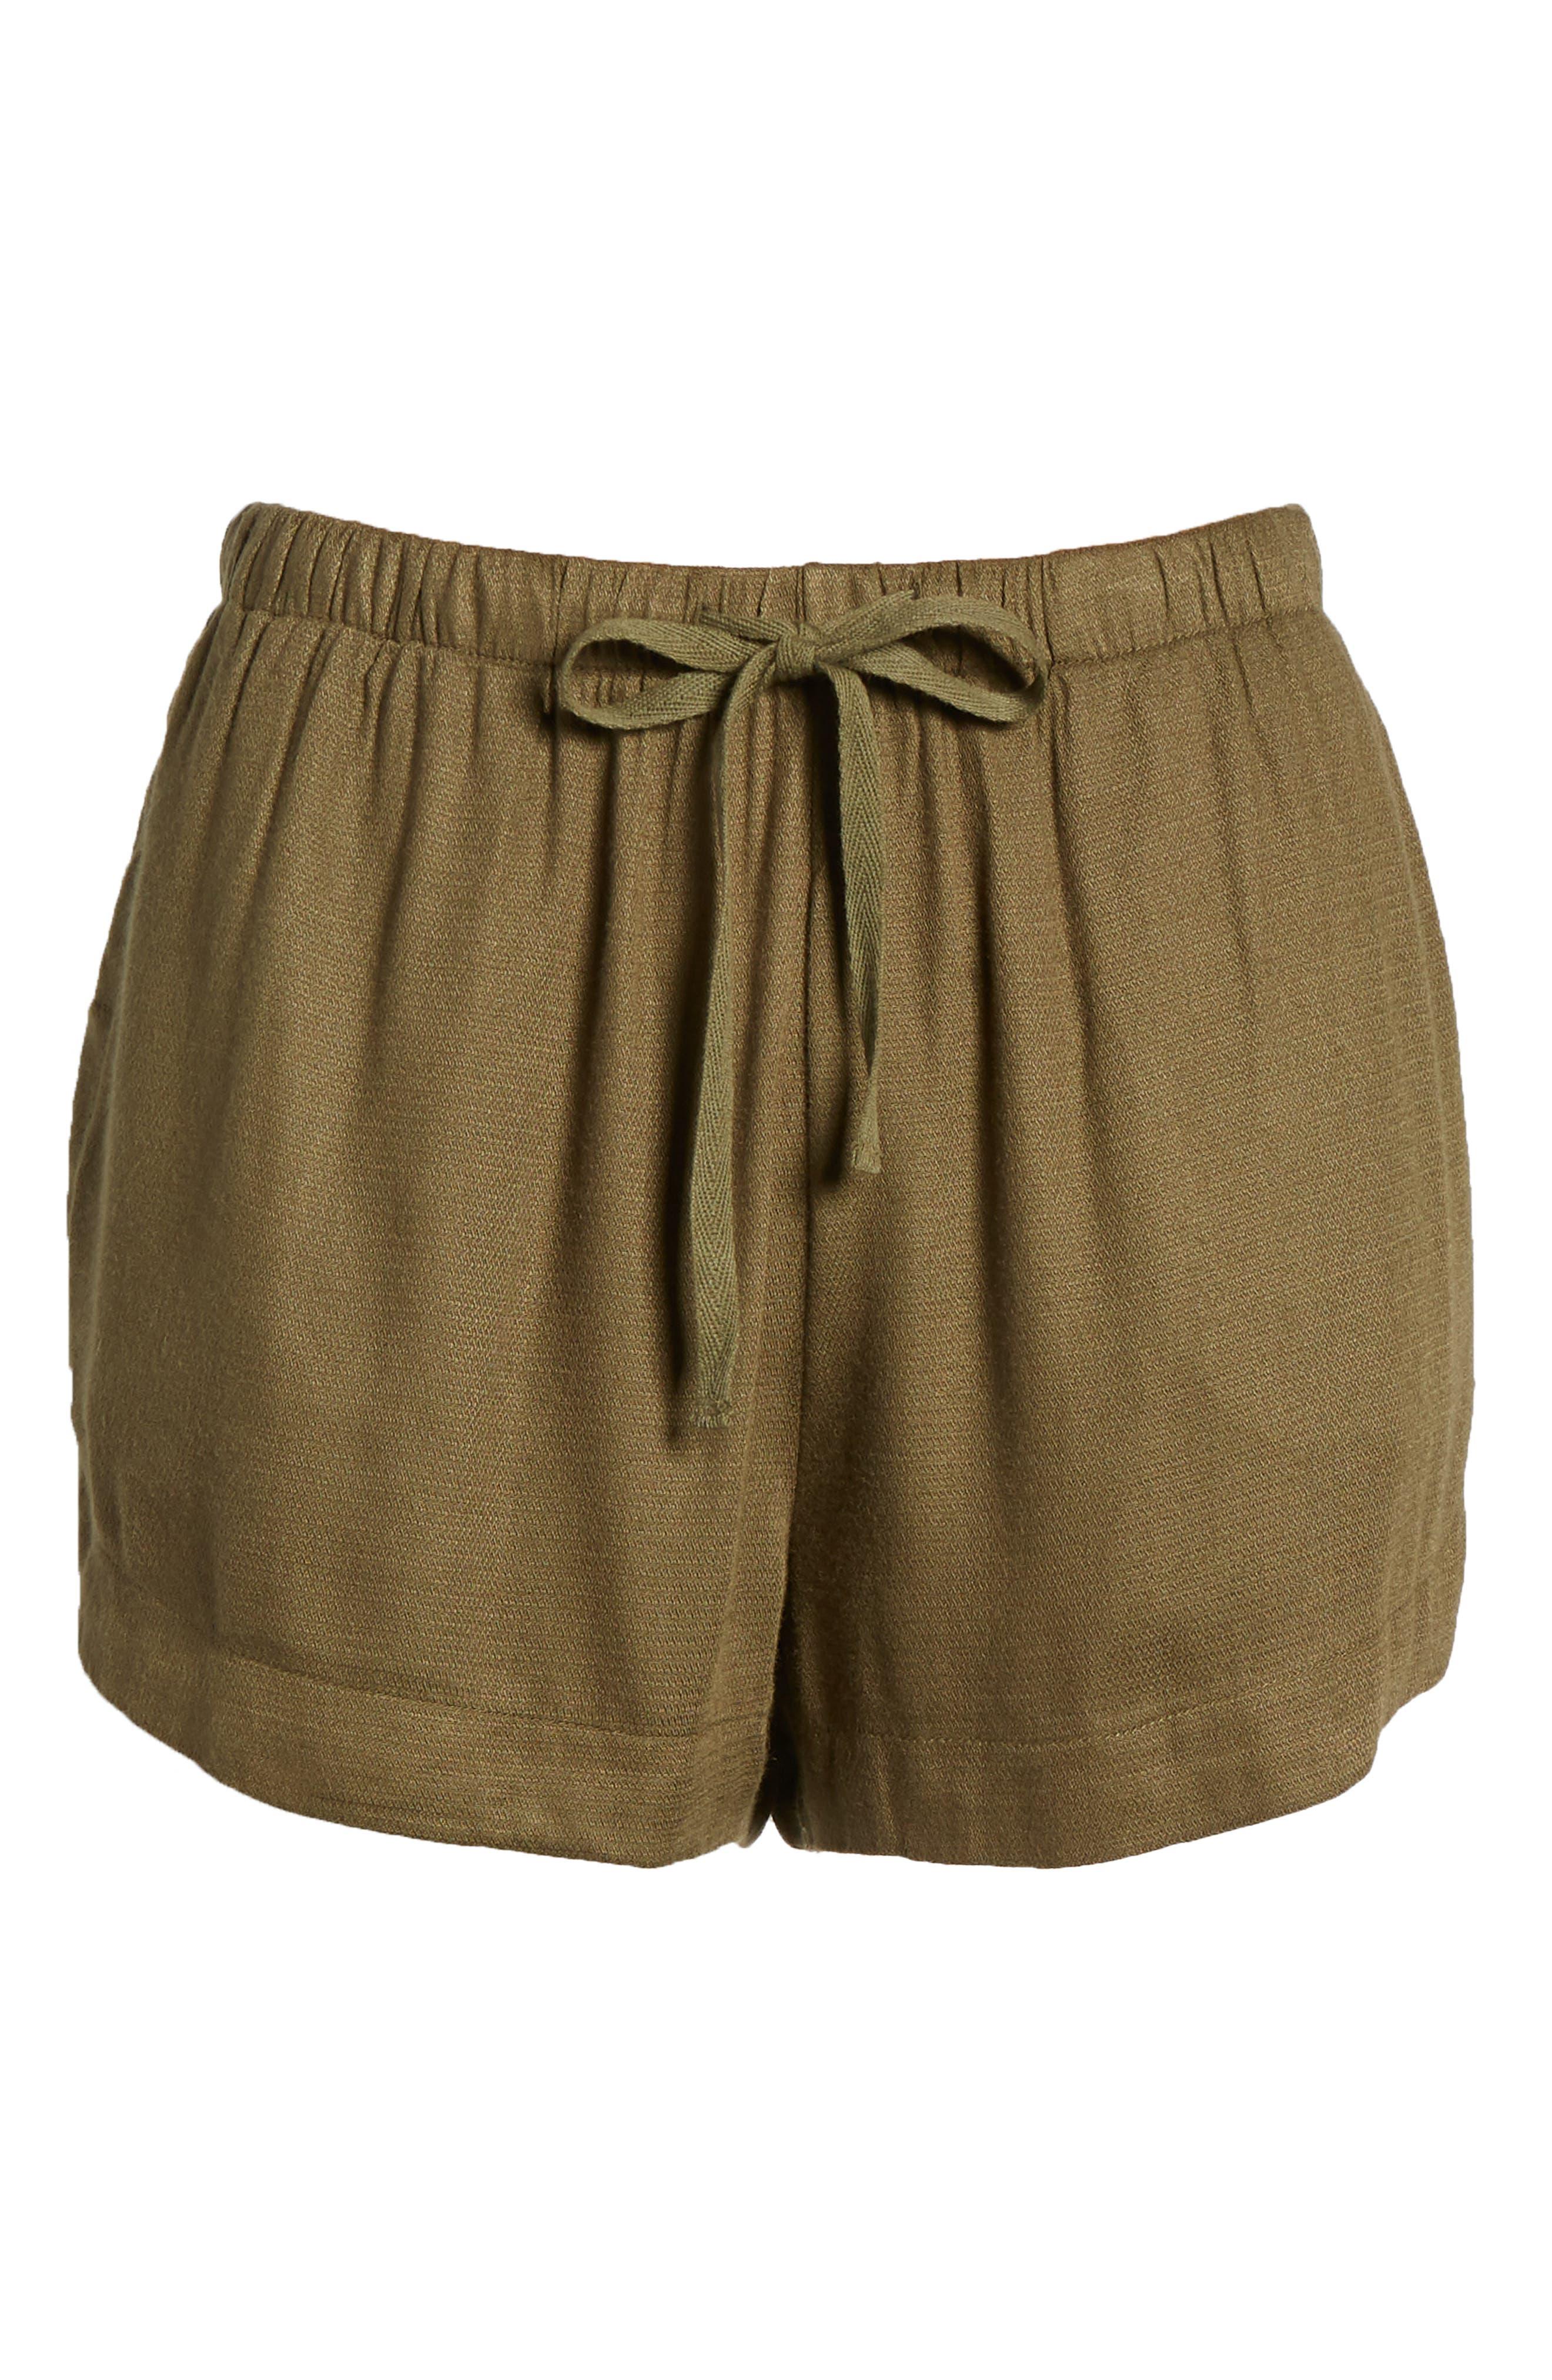 Vary Yume Shorts,                             Alternate thumbnail 7, color,                             Burnt Olive